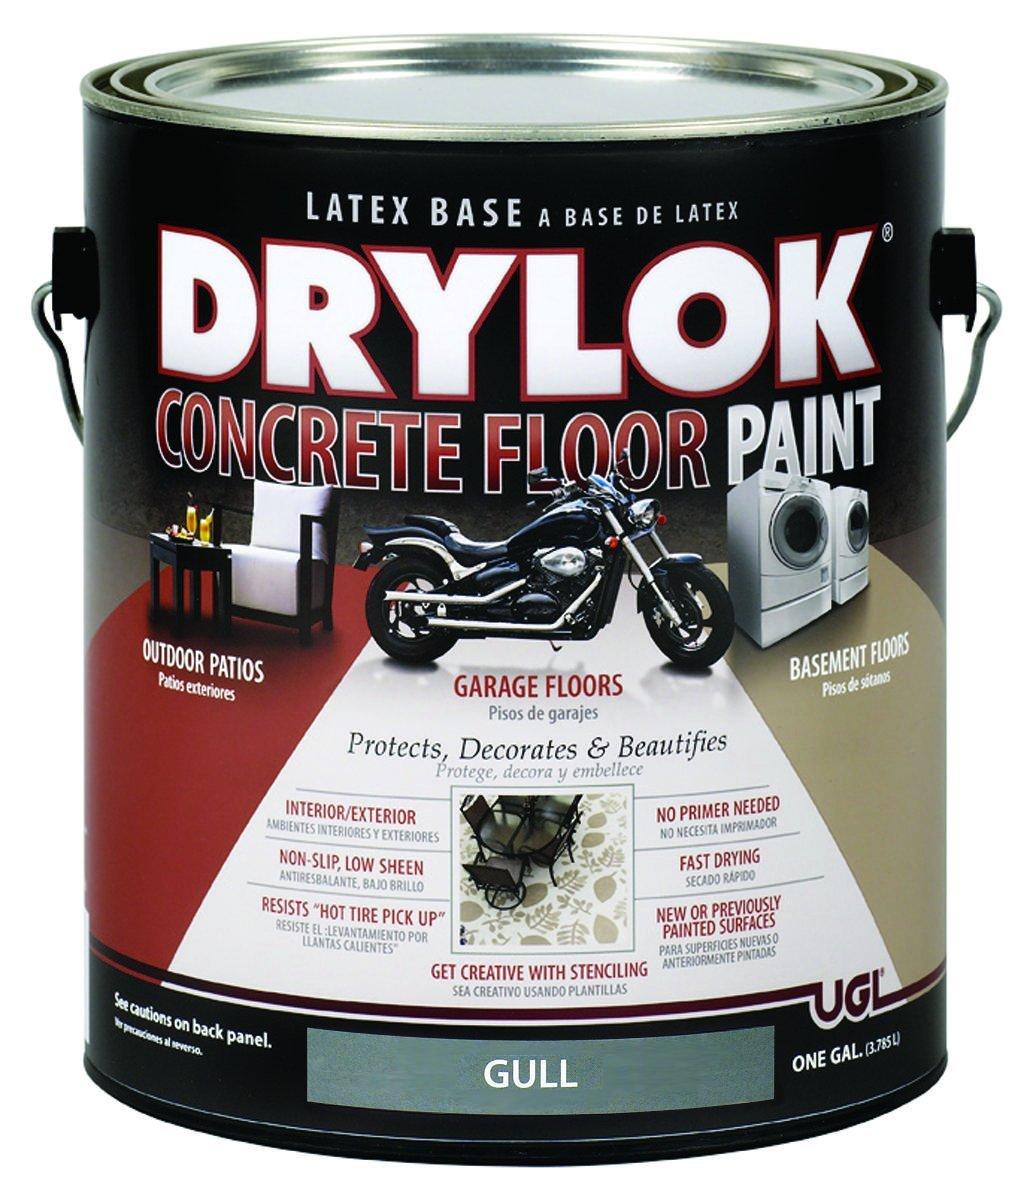 9. Drylok